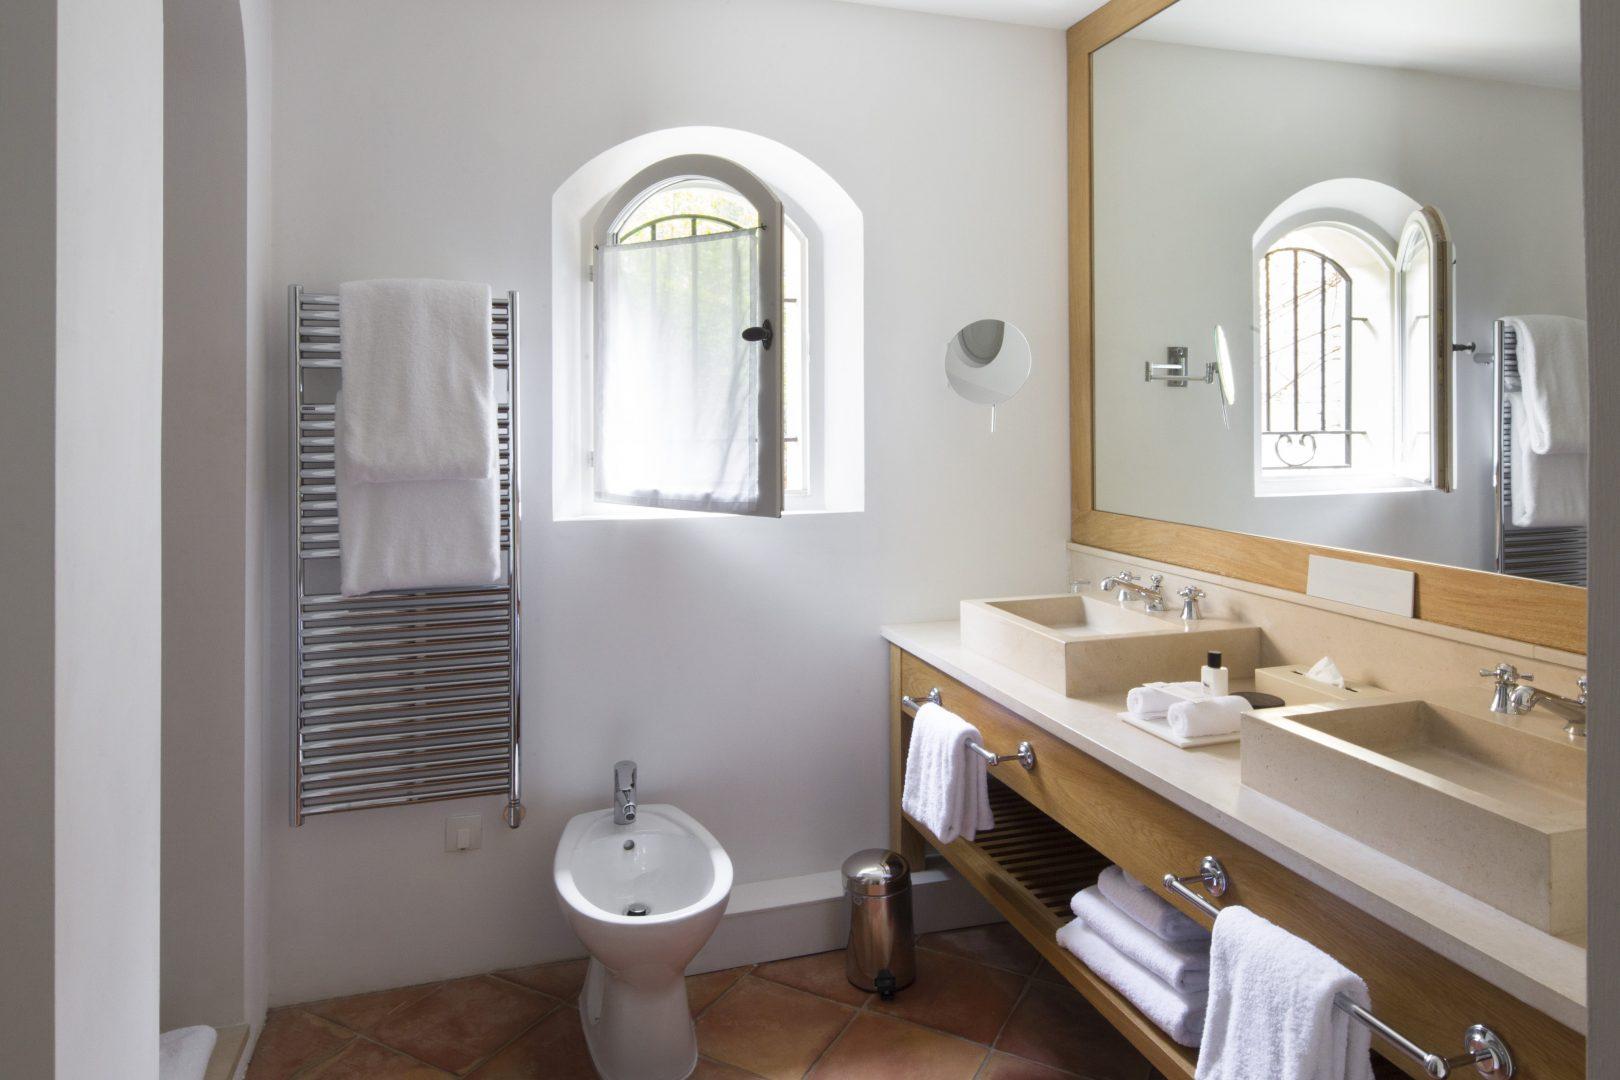 Luxury villa, sleeps 12, seaview, direct sea access, private pool, pool house